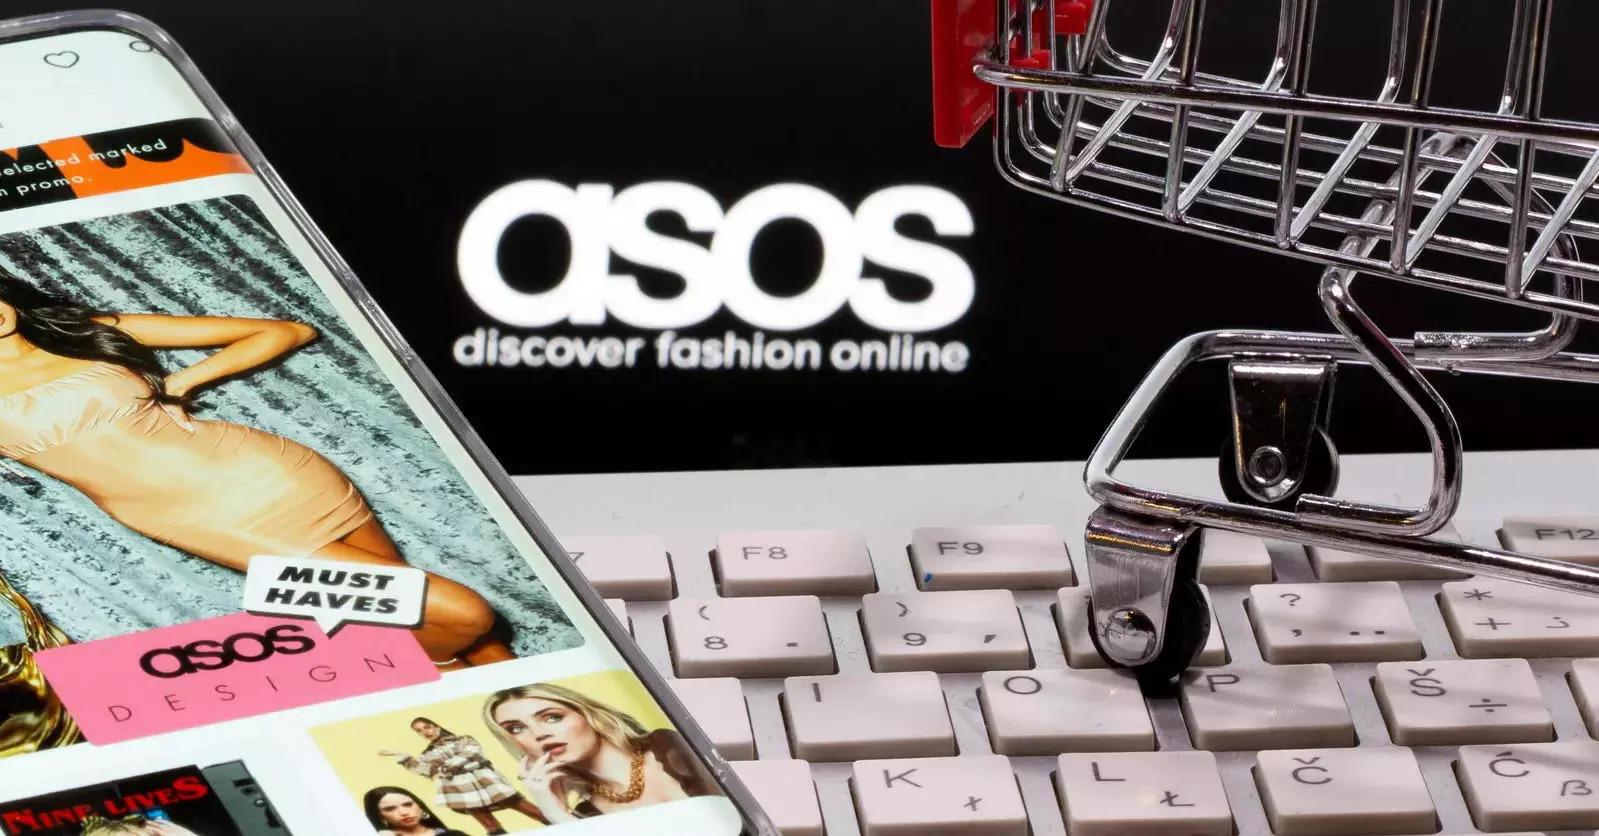 ASOS boss exits as fast fashion retailer warns on profit